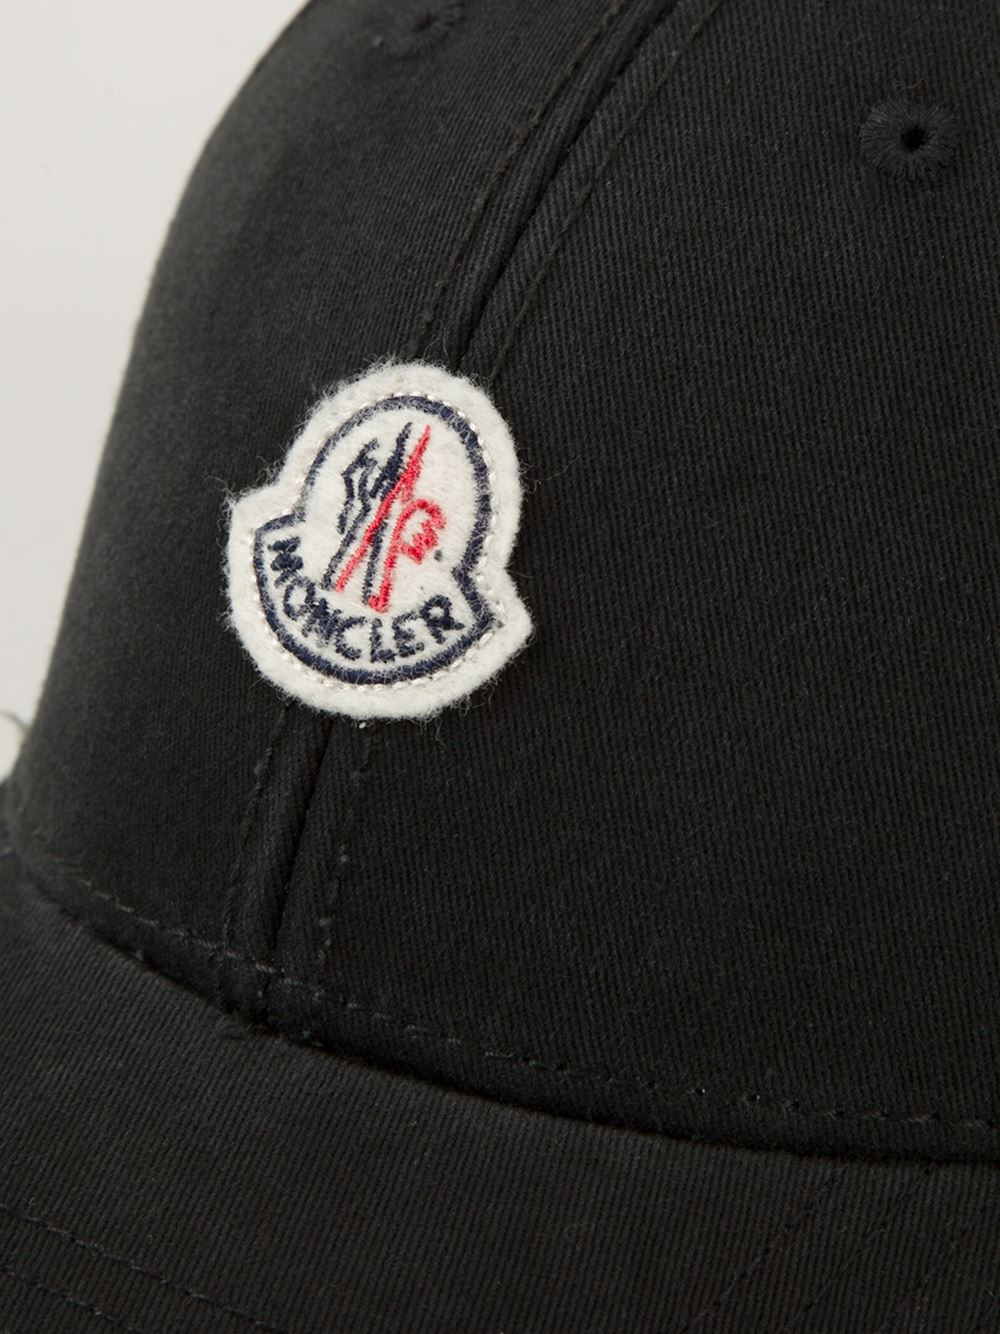 Lyst - Moncler Classic Baseball Cap in Black for Men 4757026c7